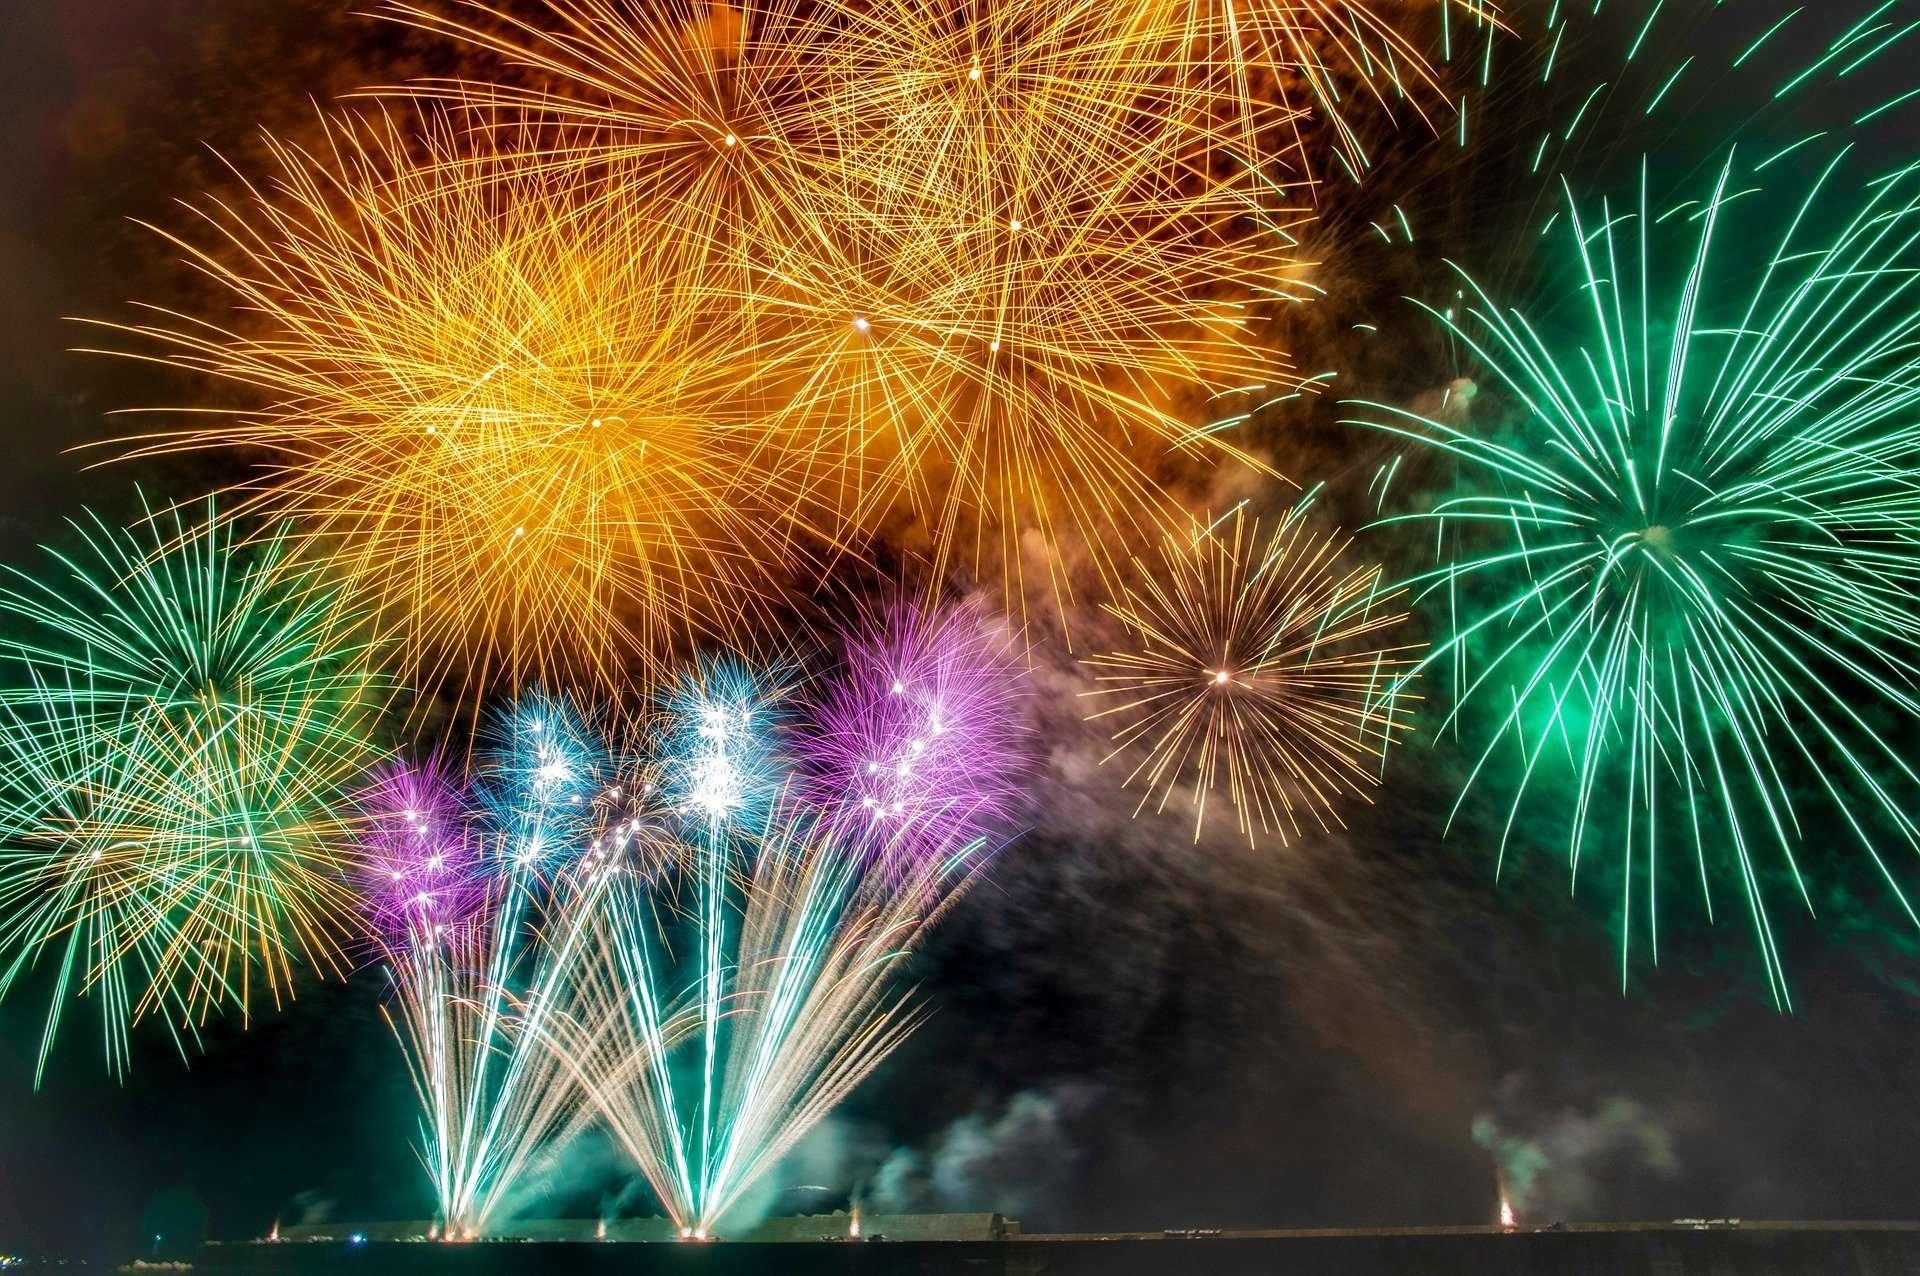 Generic fireworks photo for Kumagaya fireworks event information